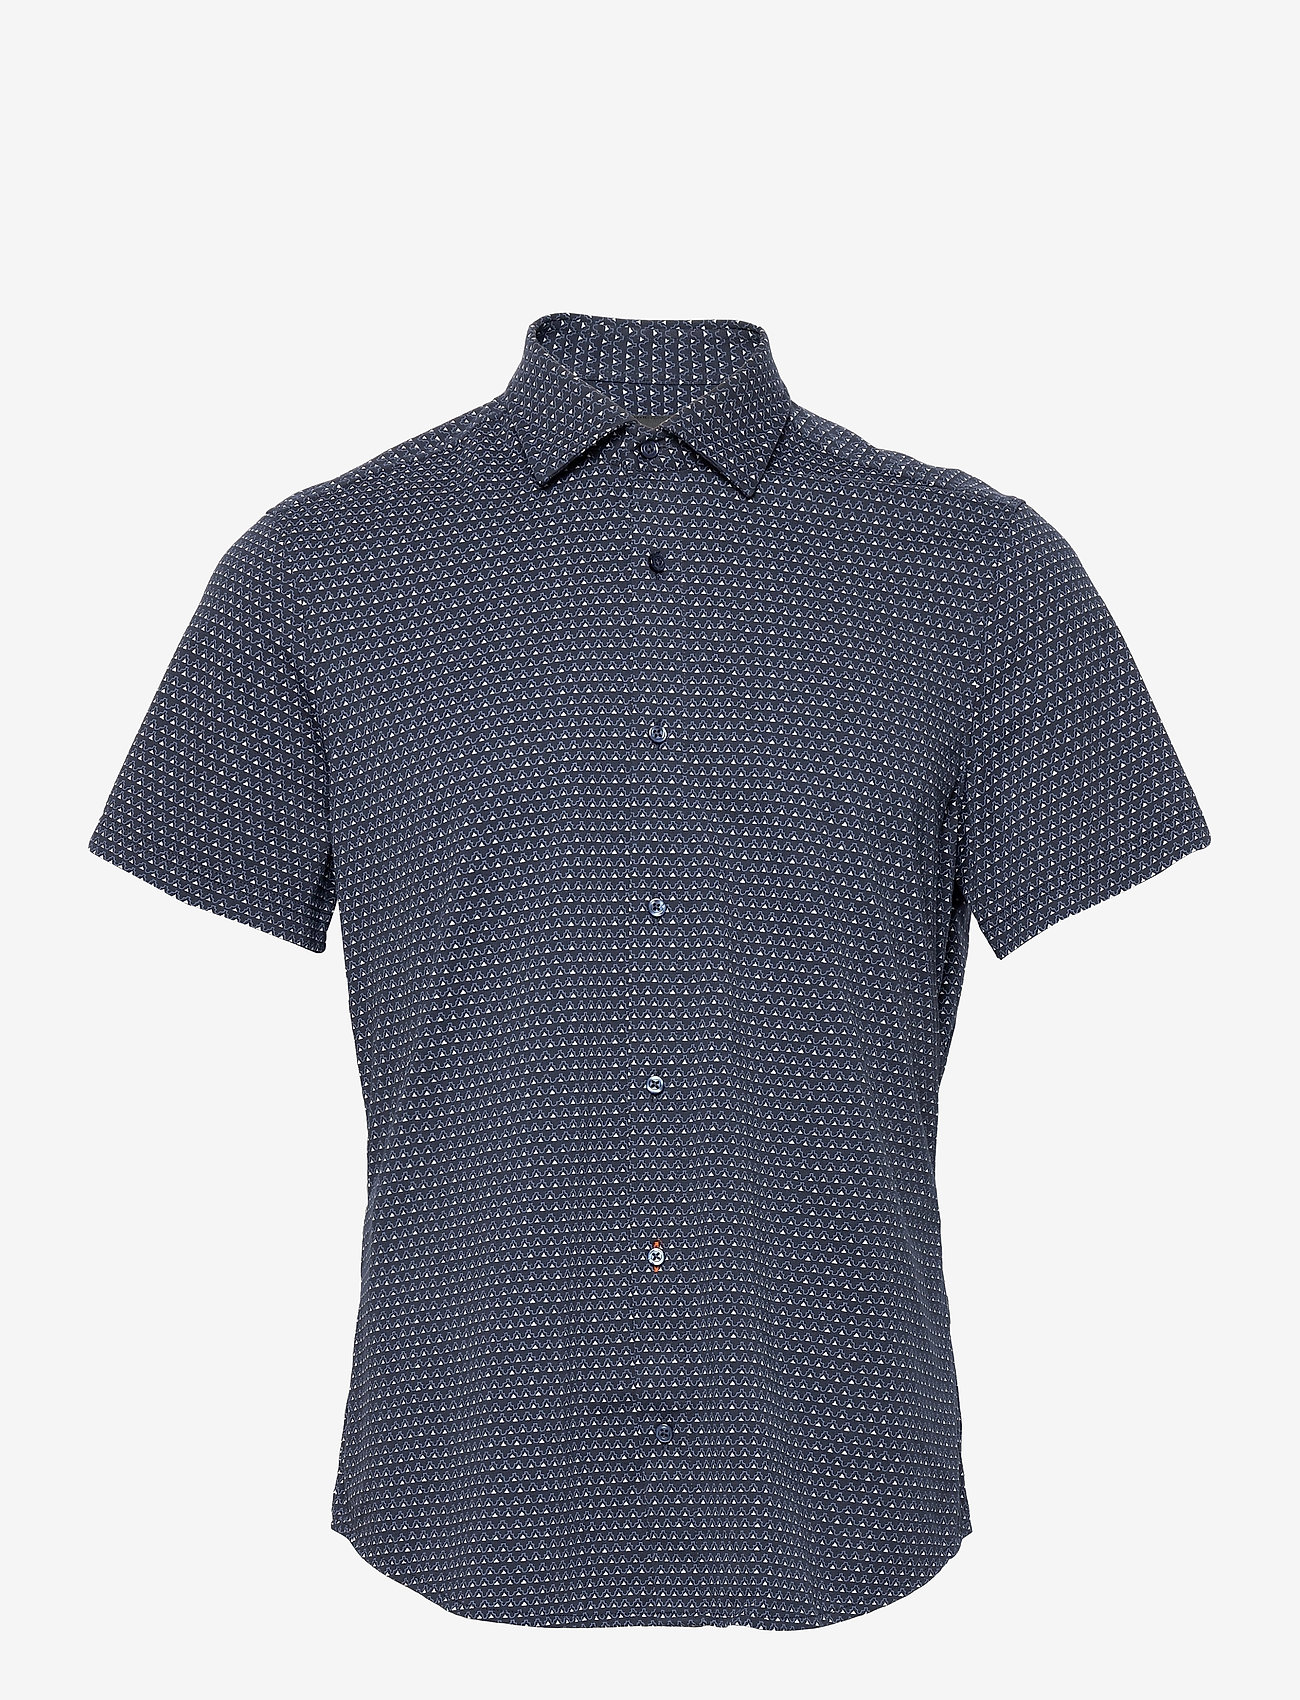 BOSS - Rash - chemises à manches courtes - dark blue - 0